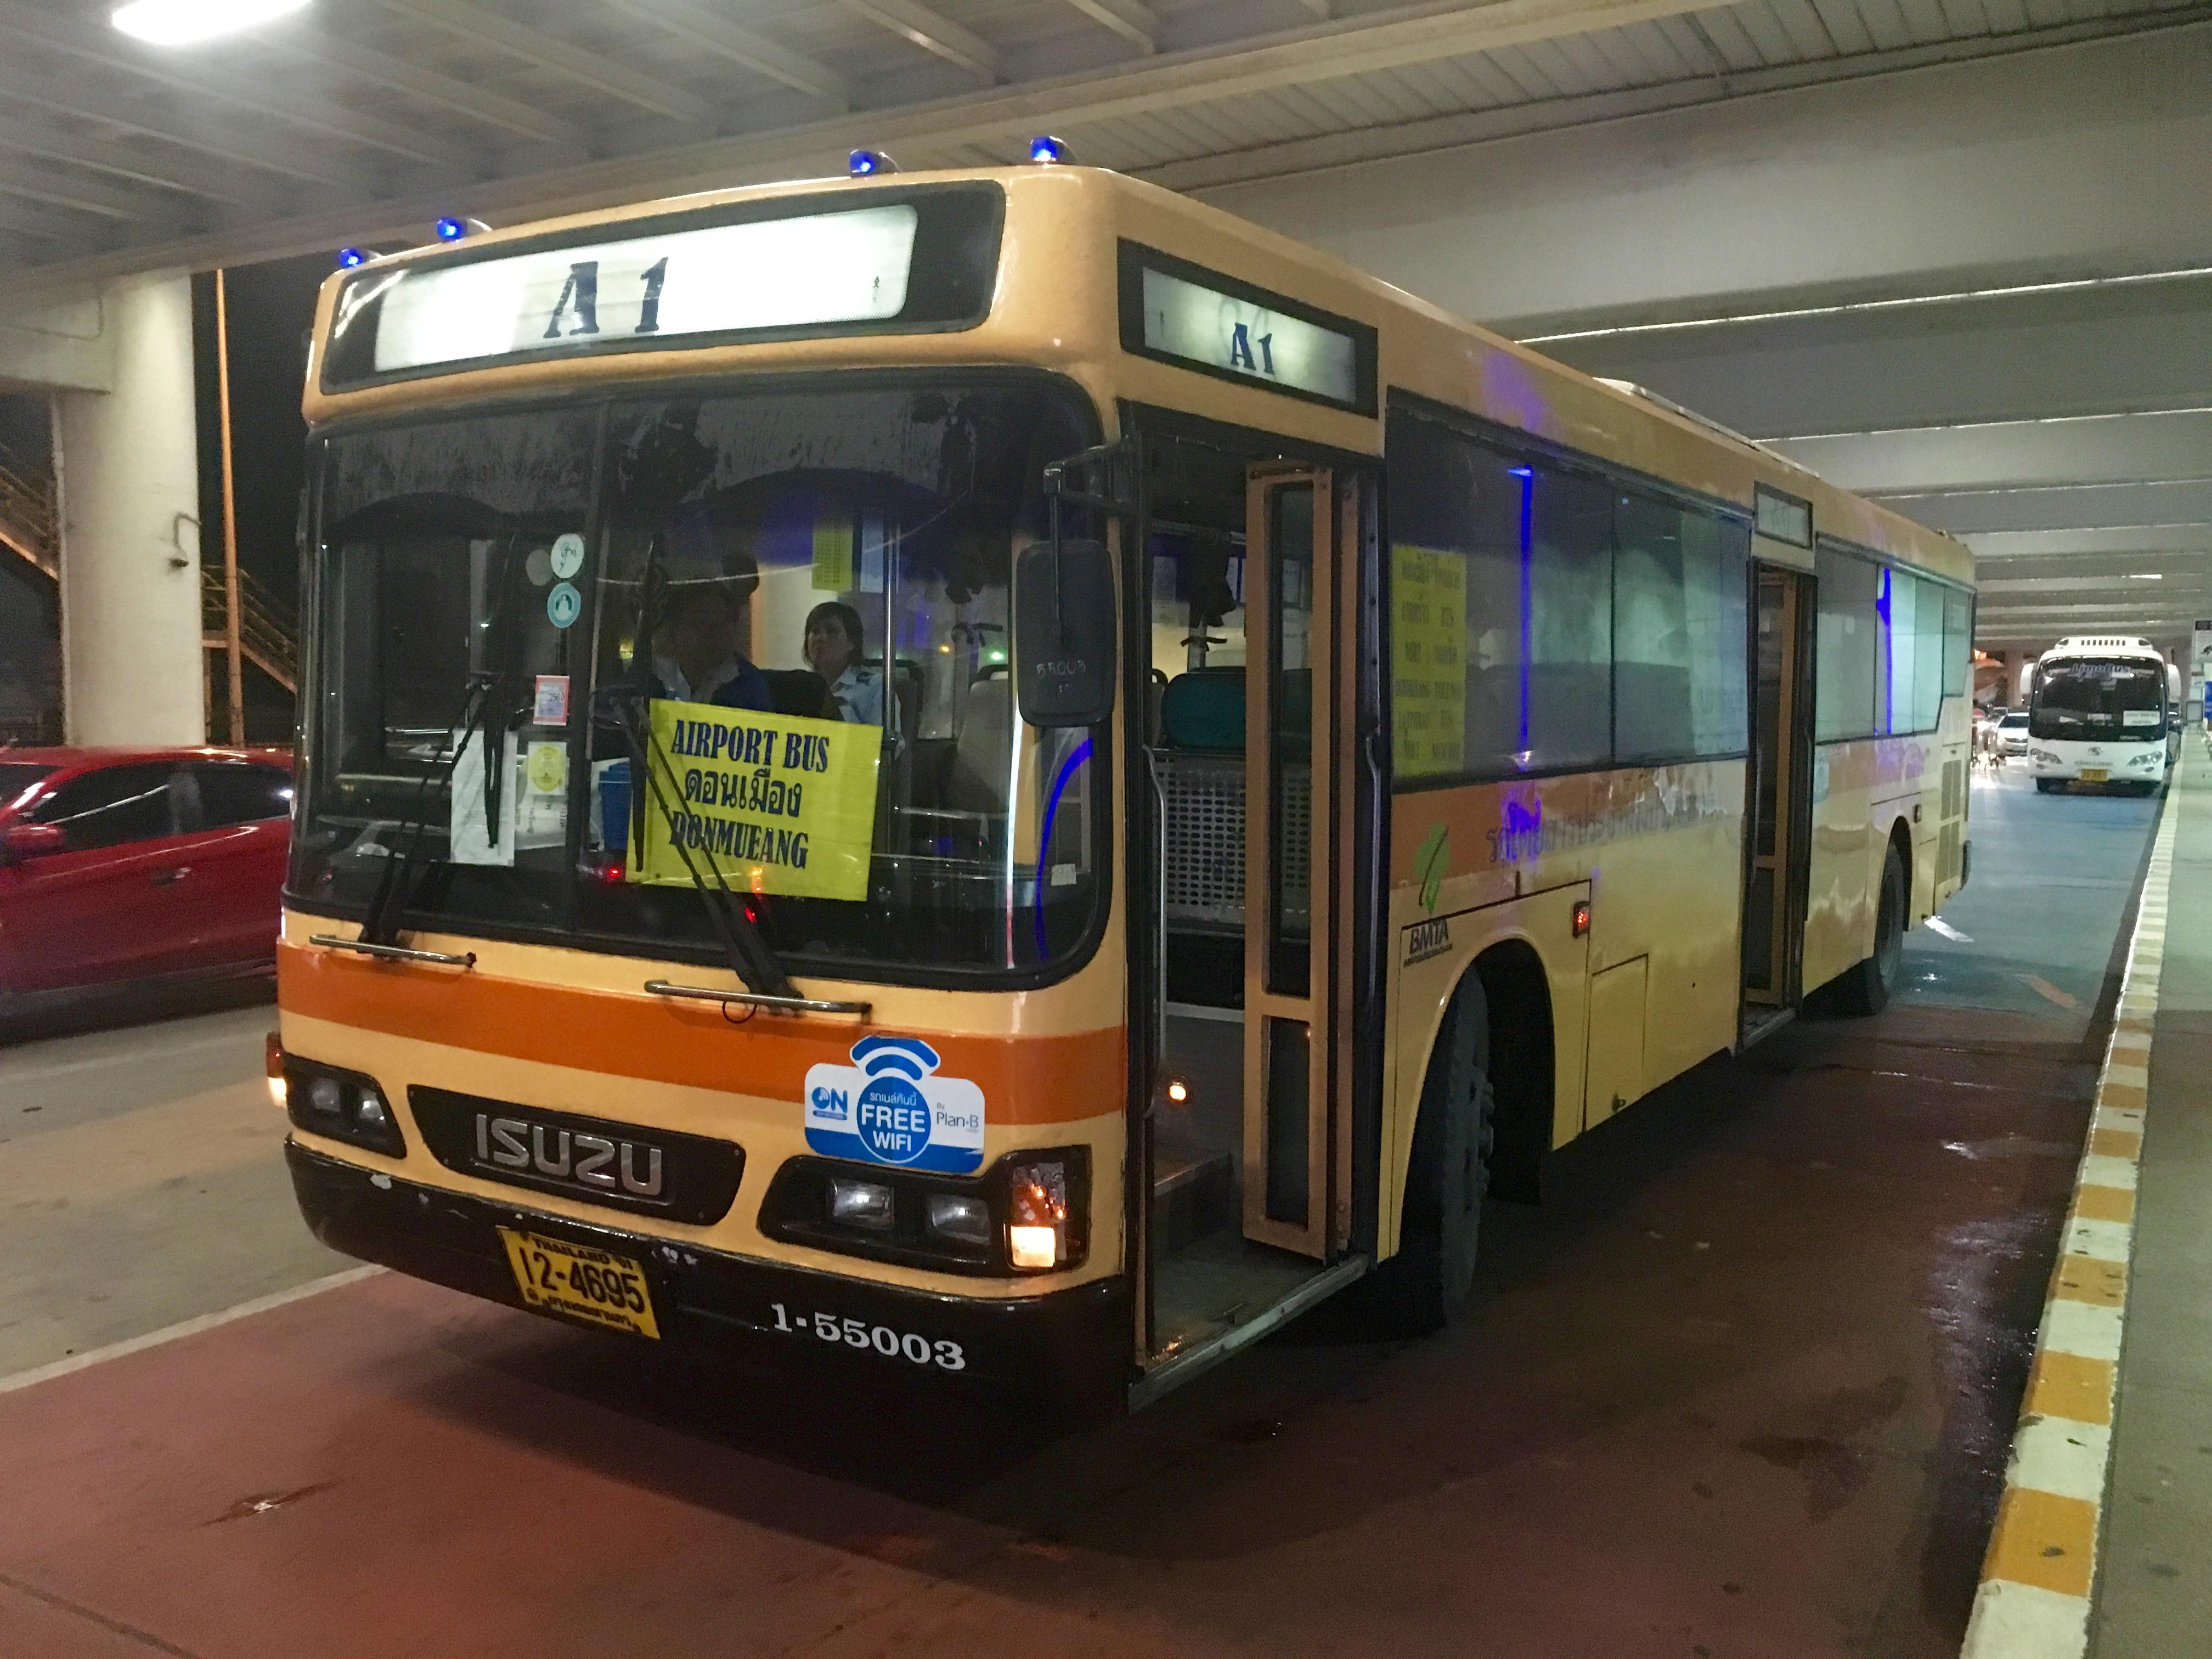 A1バス.jpg16